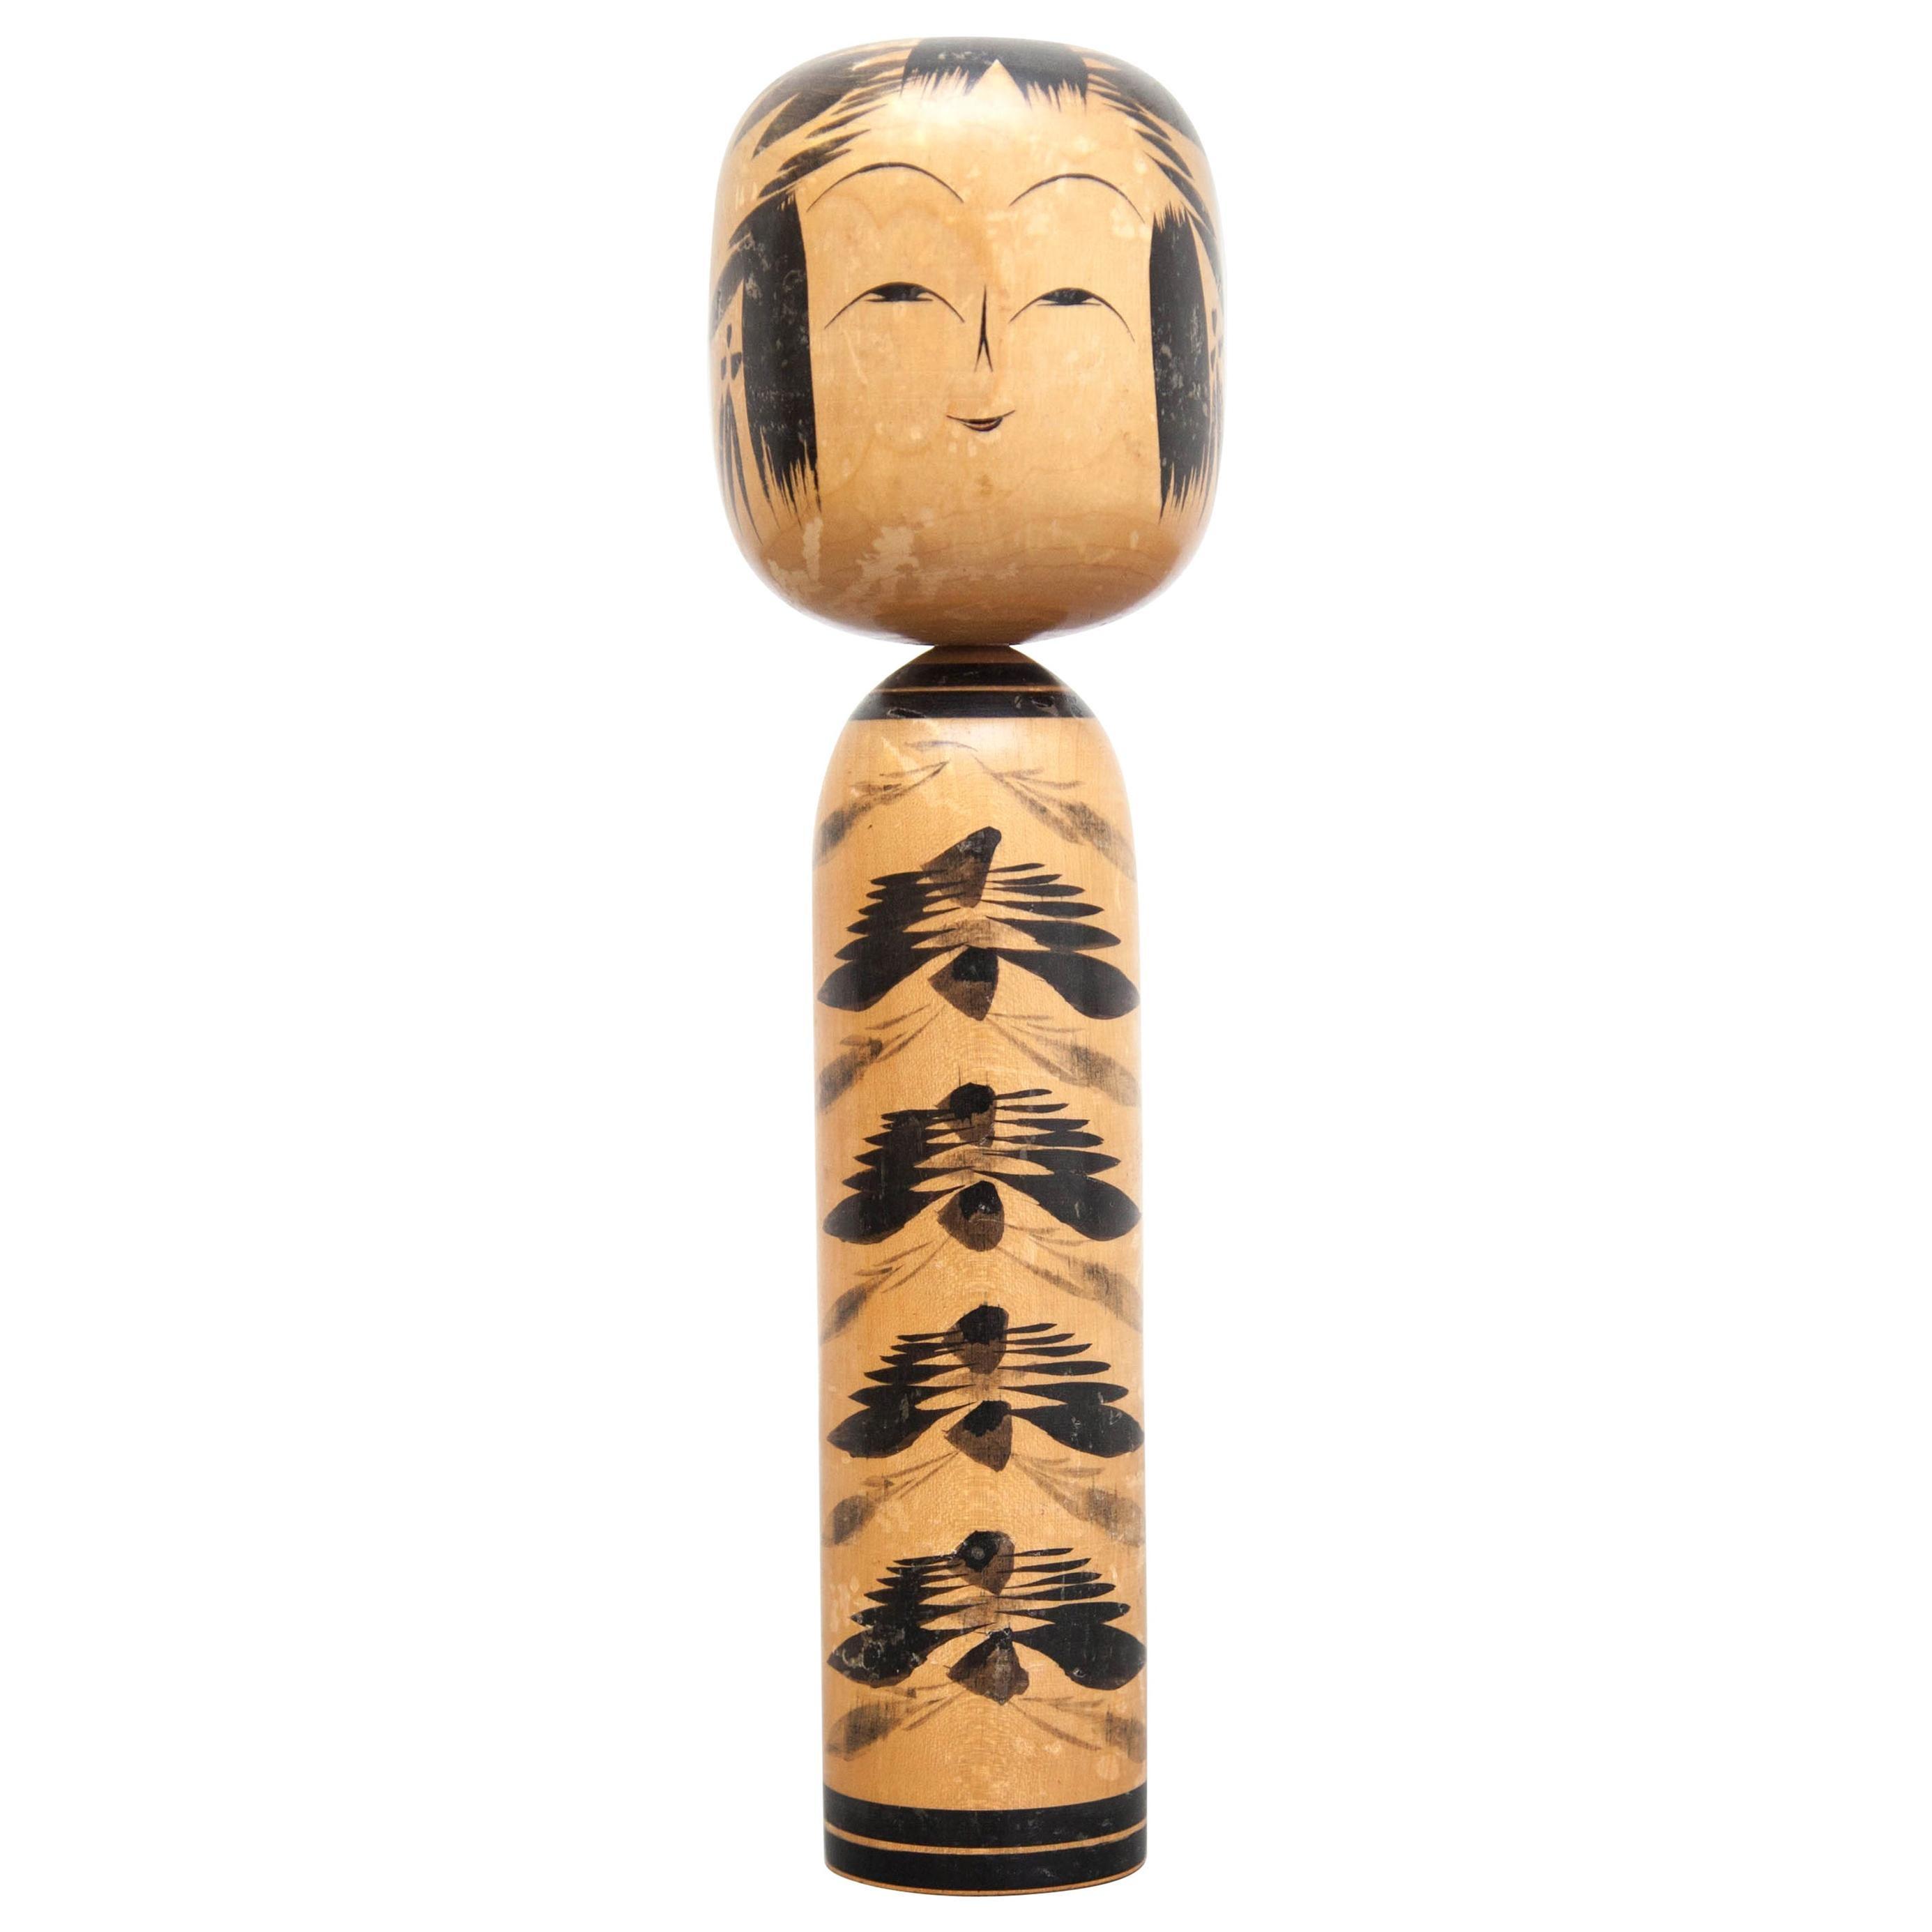 Togatta Japanese Wooden Traditional Kokeshi Doll